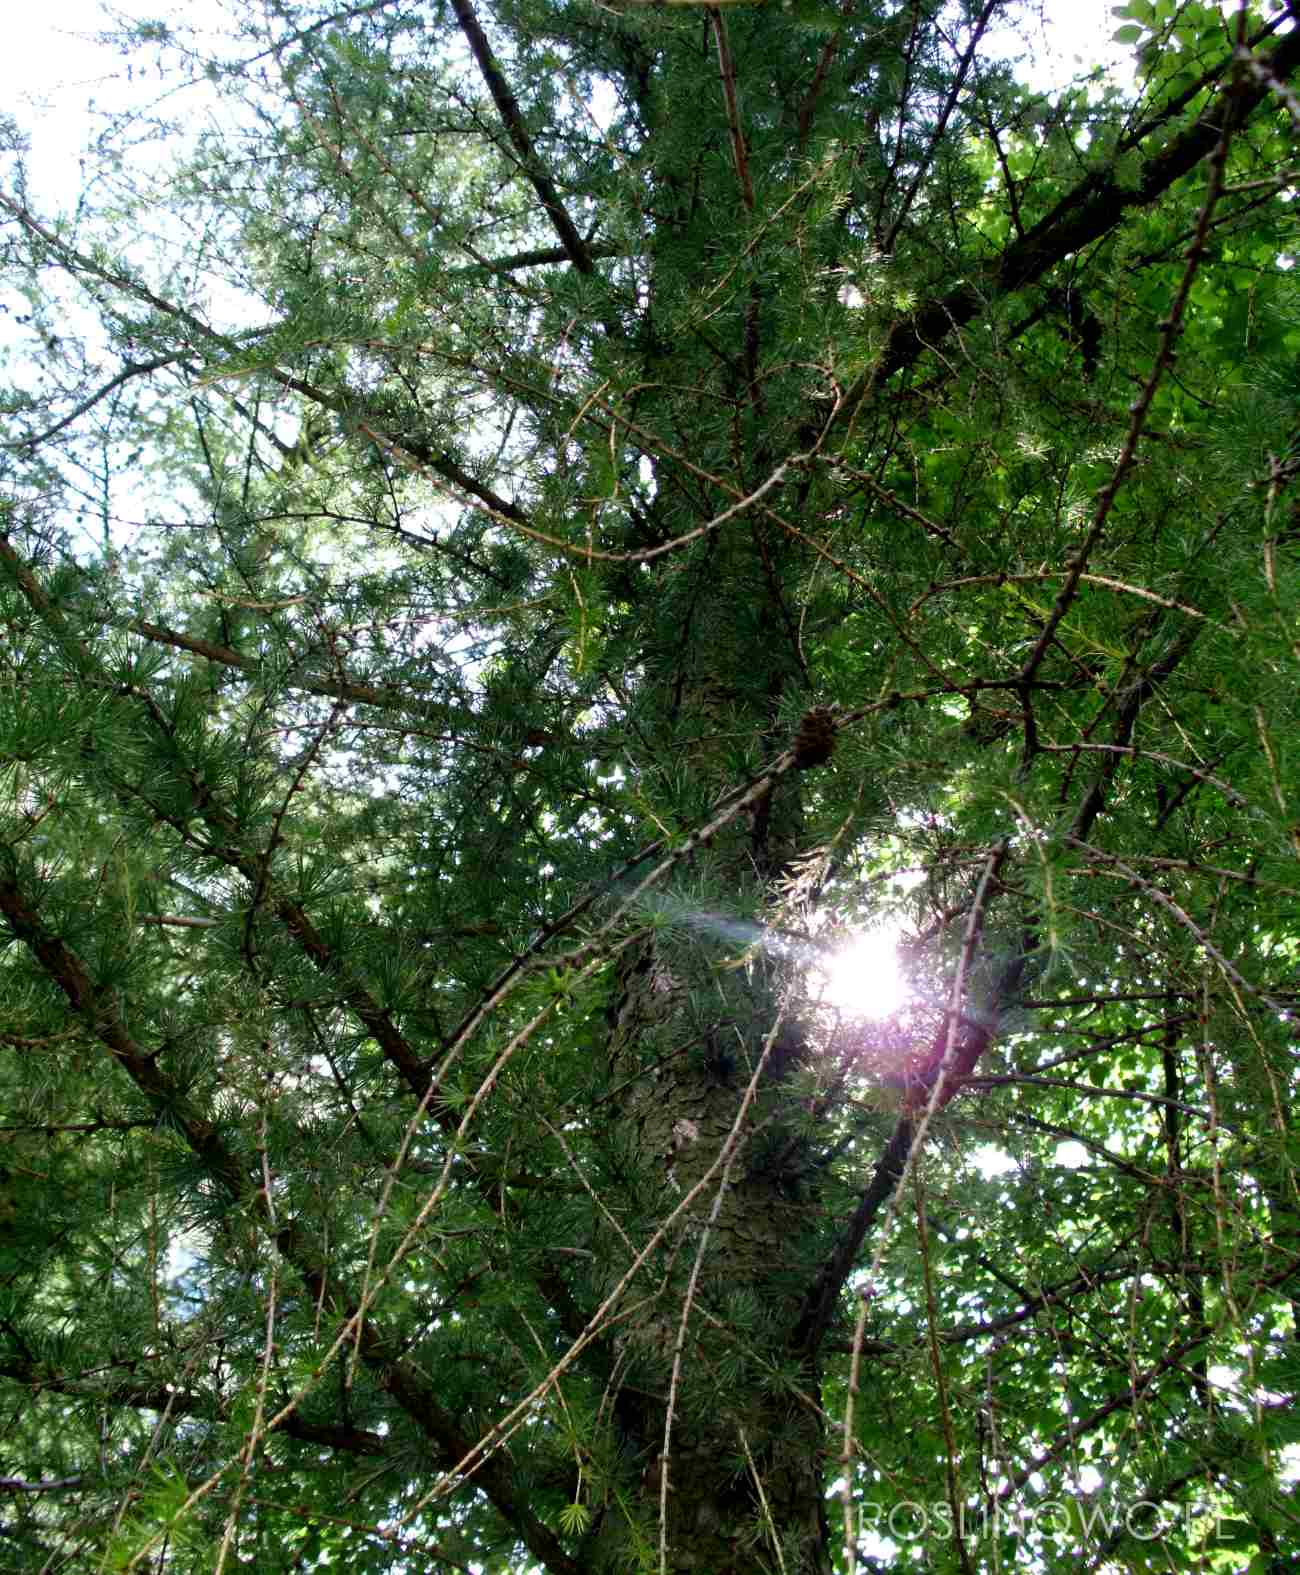 Modrzew europejski (larix decidua) popularne drzewo w terenach zieleni.